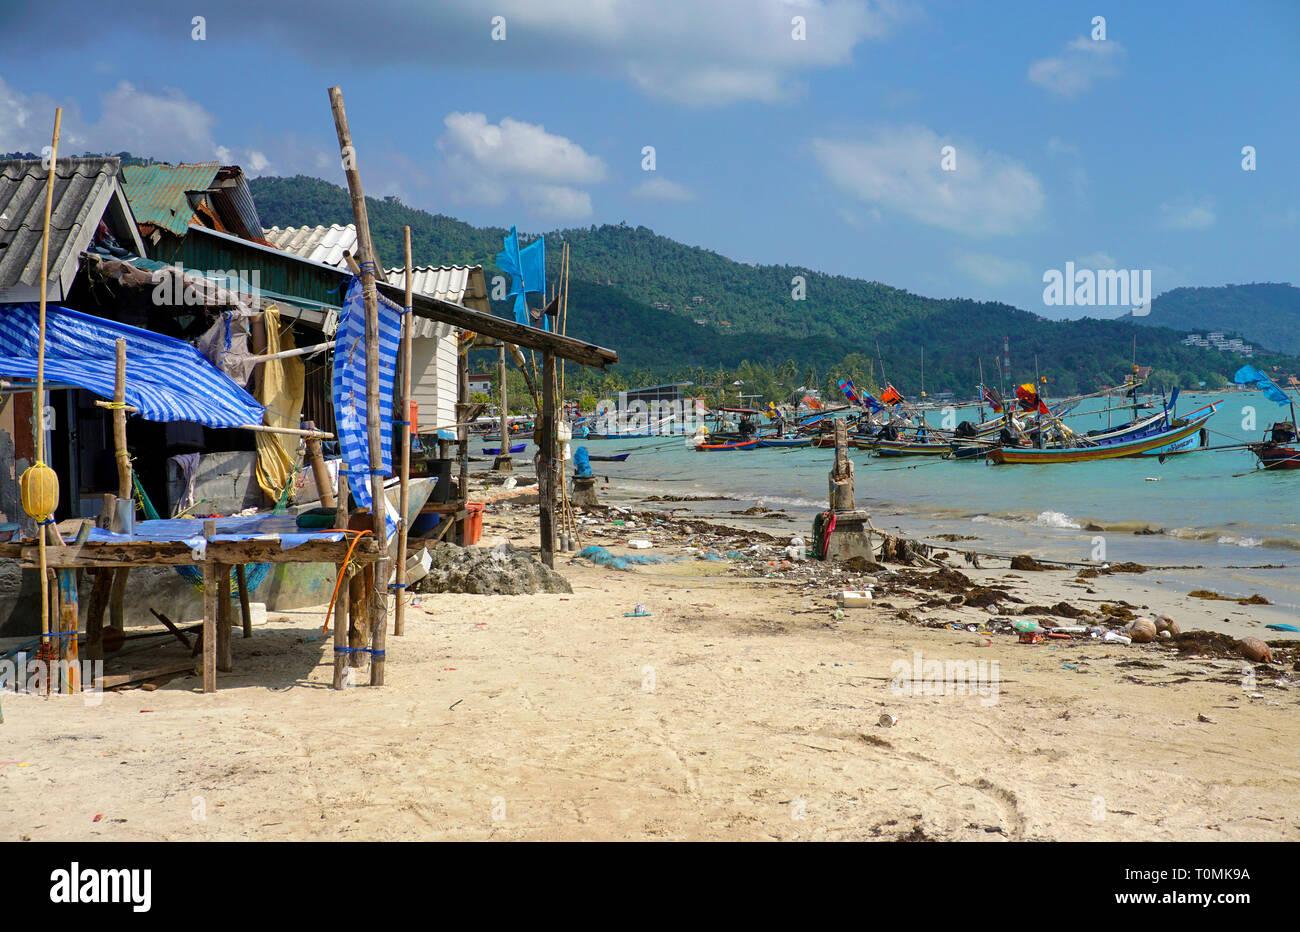 The fishing village Hua Thanon, fishing boats at the lagoon, Koh Samui, Gulf of Thailand, Thailand - Stock Image